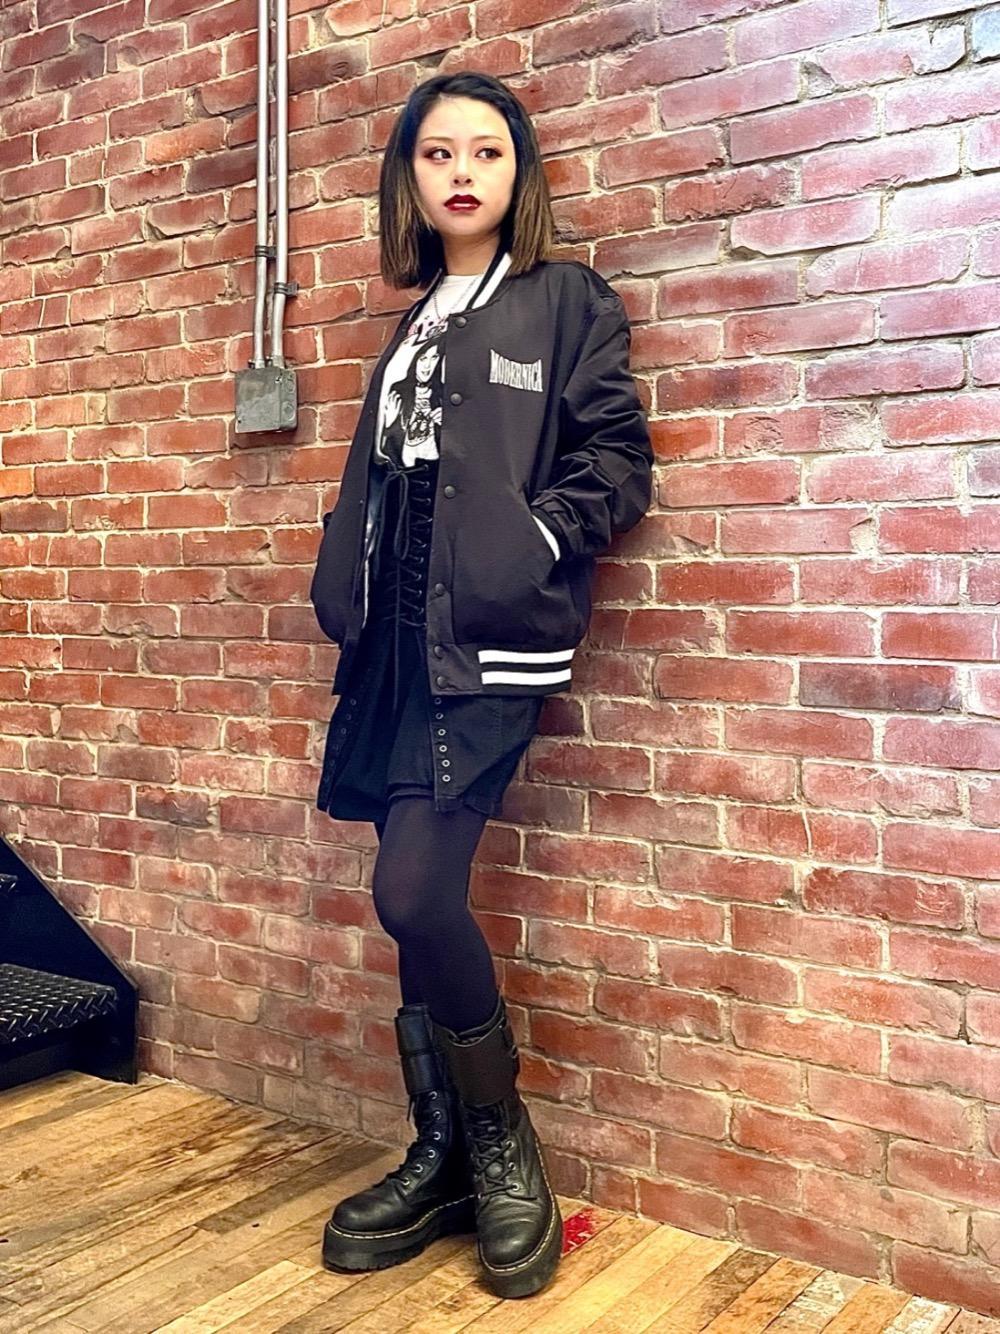 MODERNICAコラボのサテンジャケットを着てみました✨ シンプルなデザインで合わせやすく女性にもおすすめです!